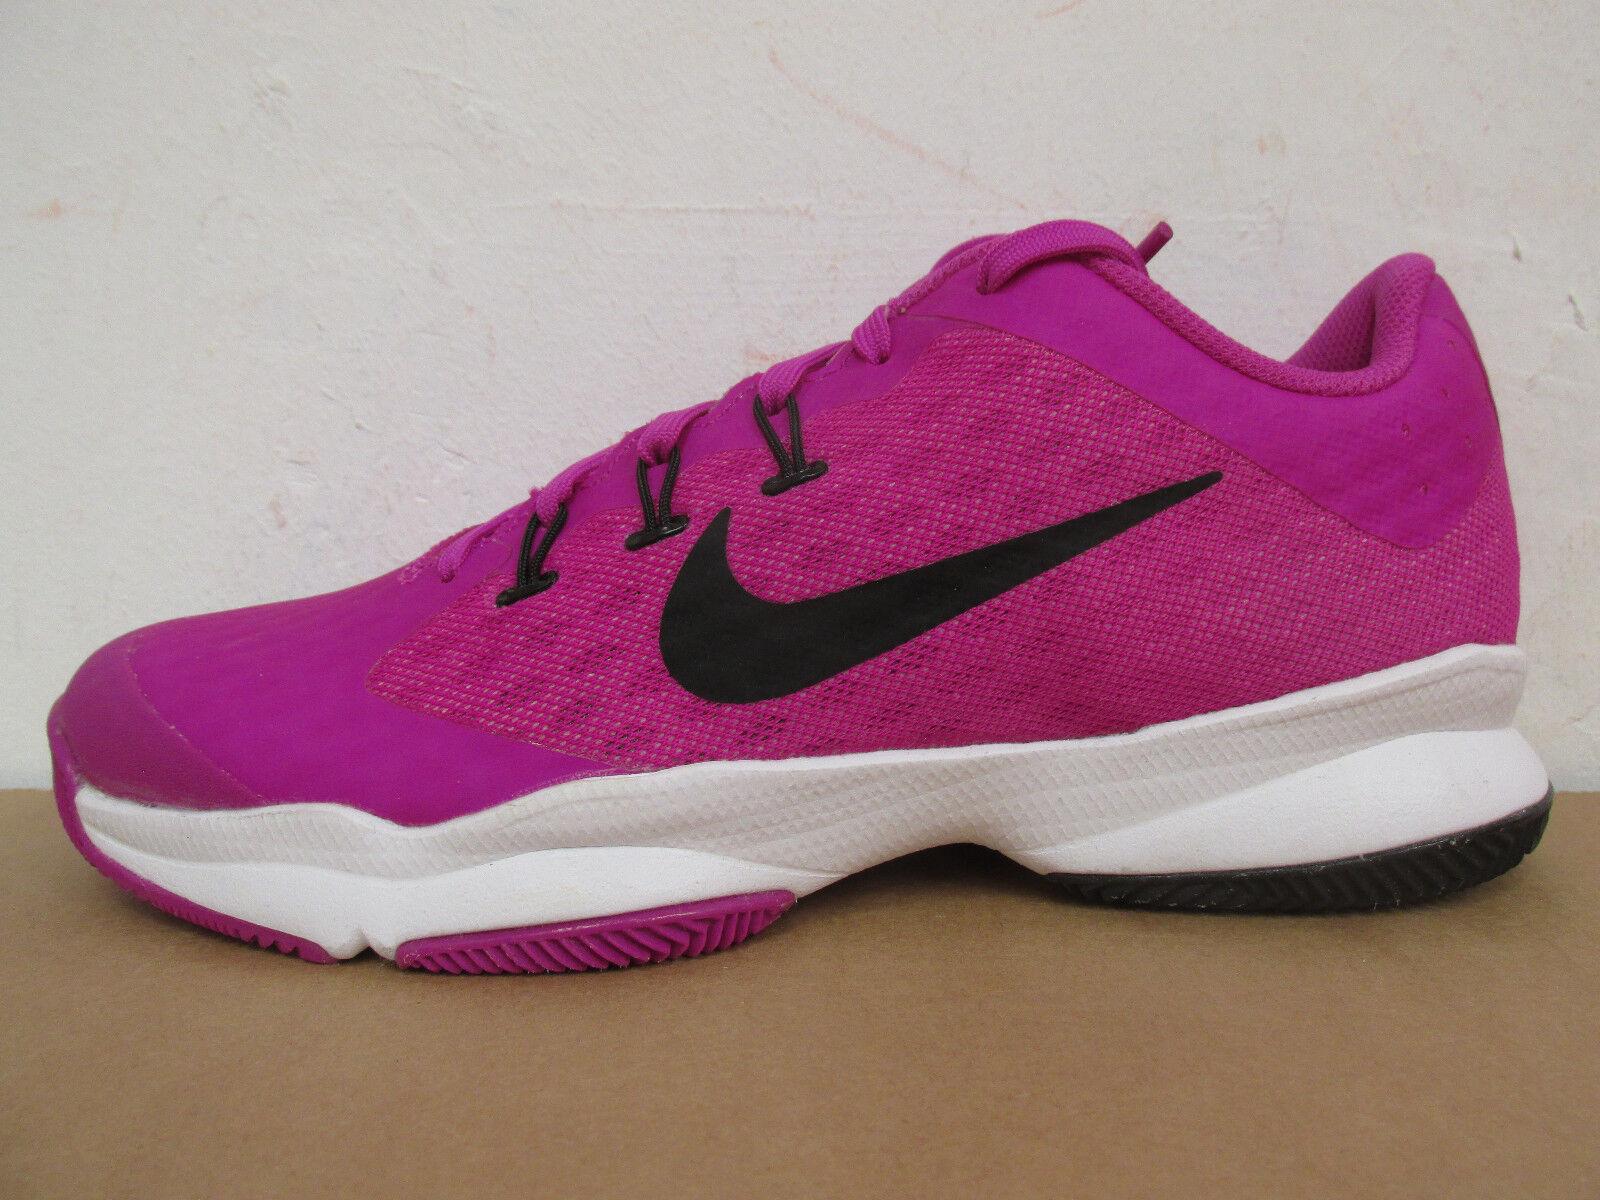 nike nike nike air zoom ultra femminili dei formatori 845046 500 scarpe scarpe clearance | Exquisite (medio) lavorazione  | Sig/Sig Ra Scarpa  925544